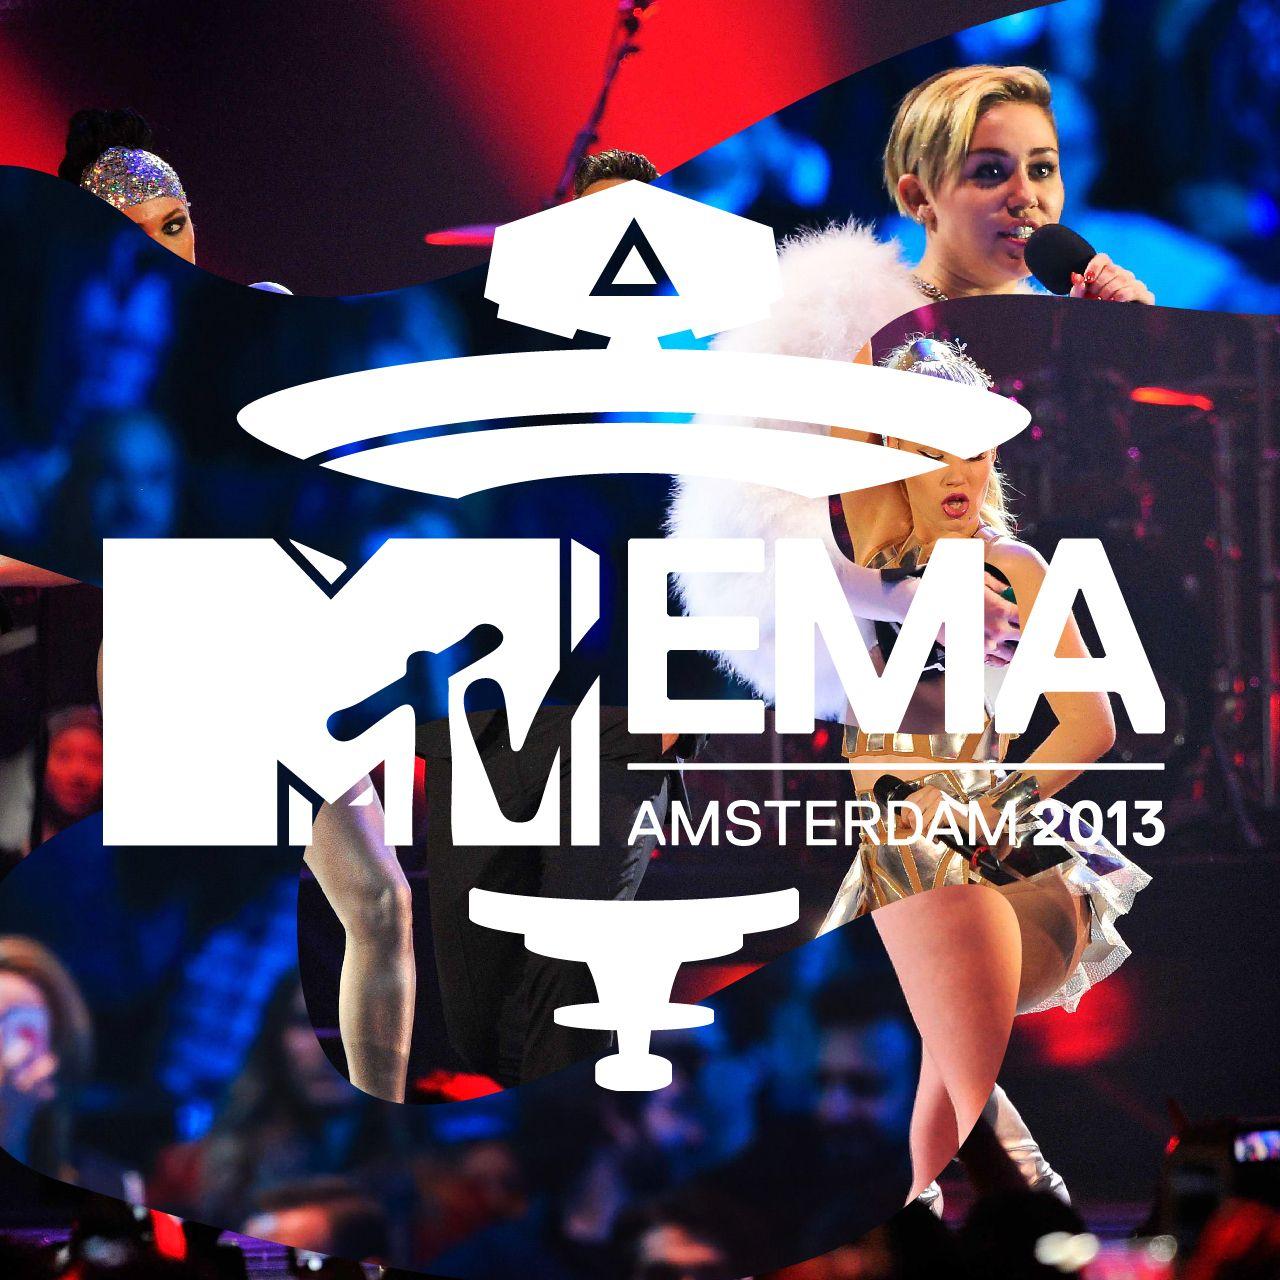 mtv ema 2015 full show torrent